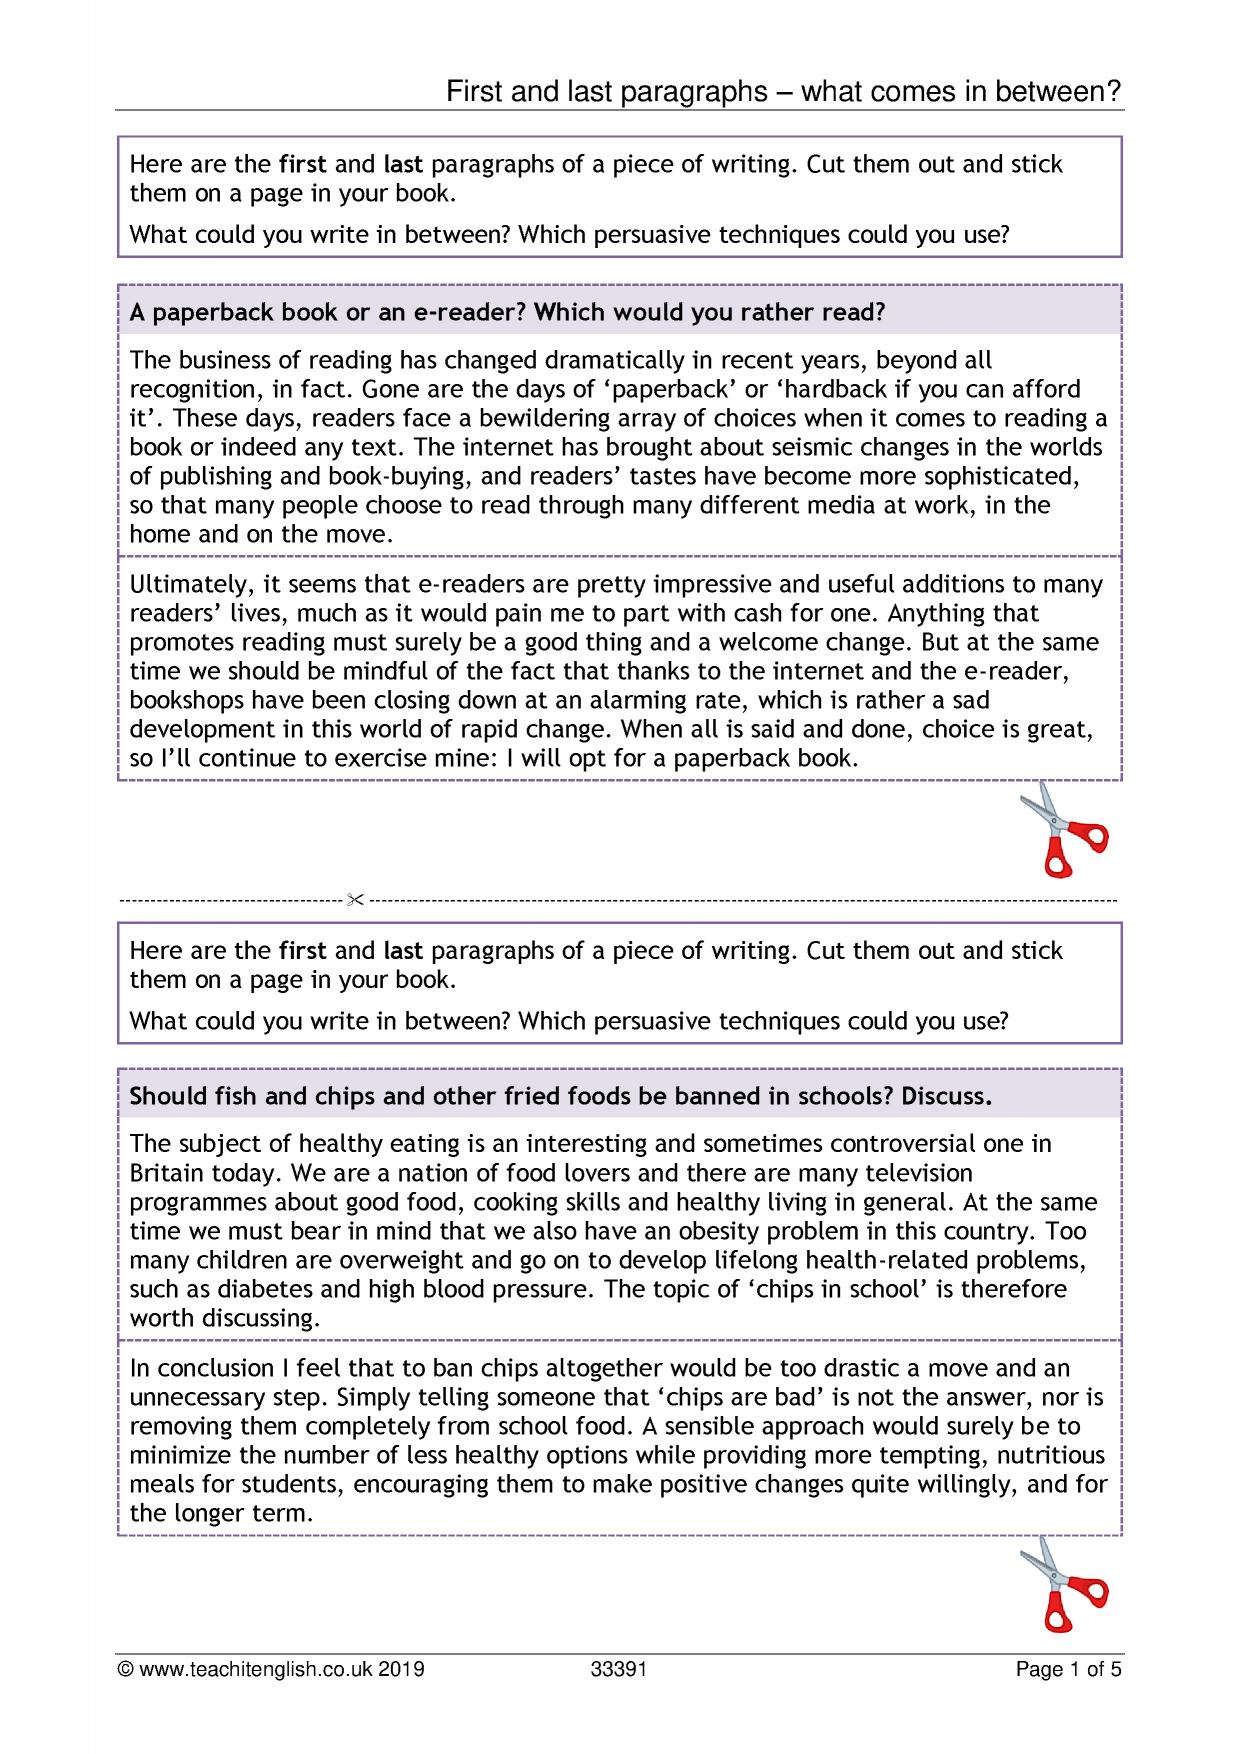 Persuasive Letter Example For Kids